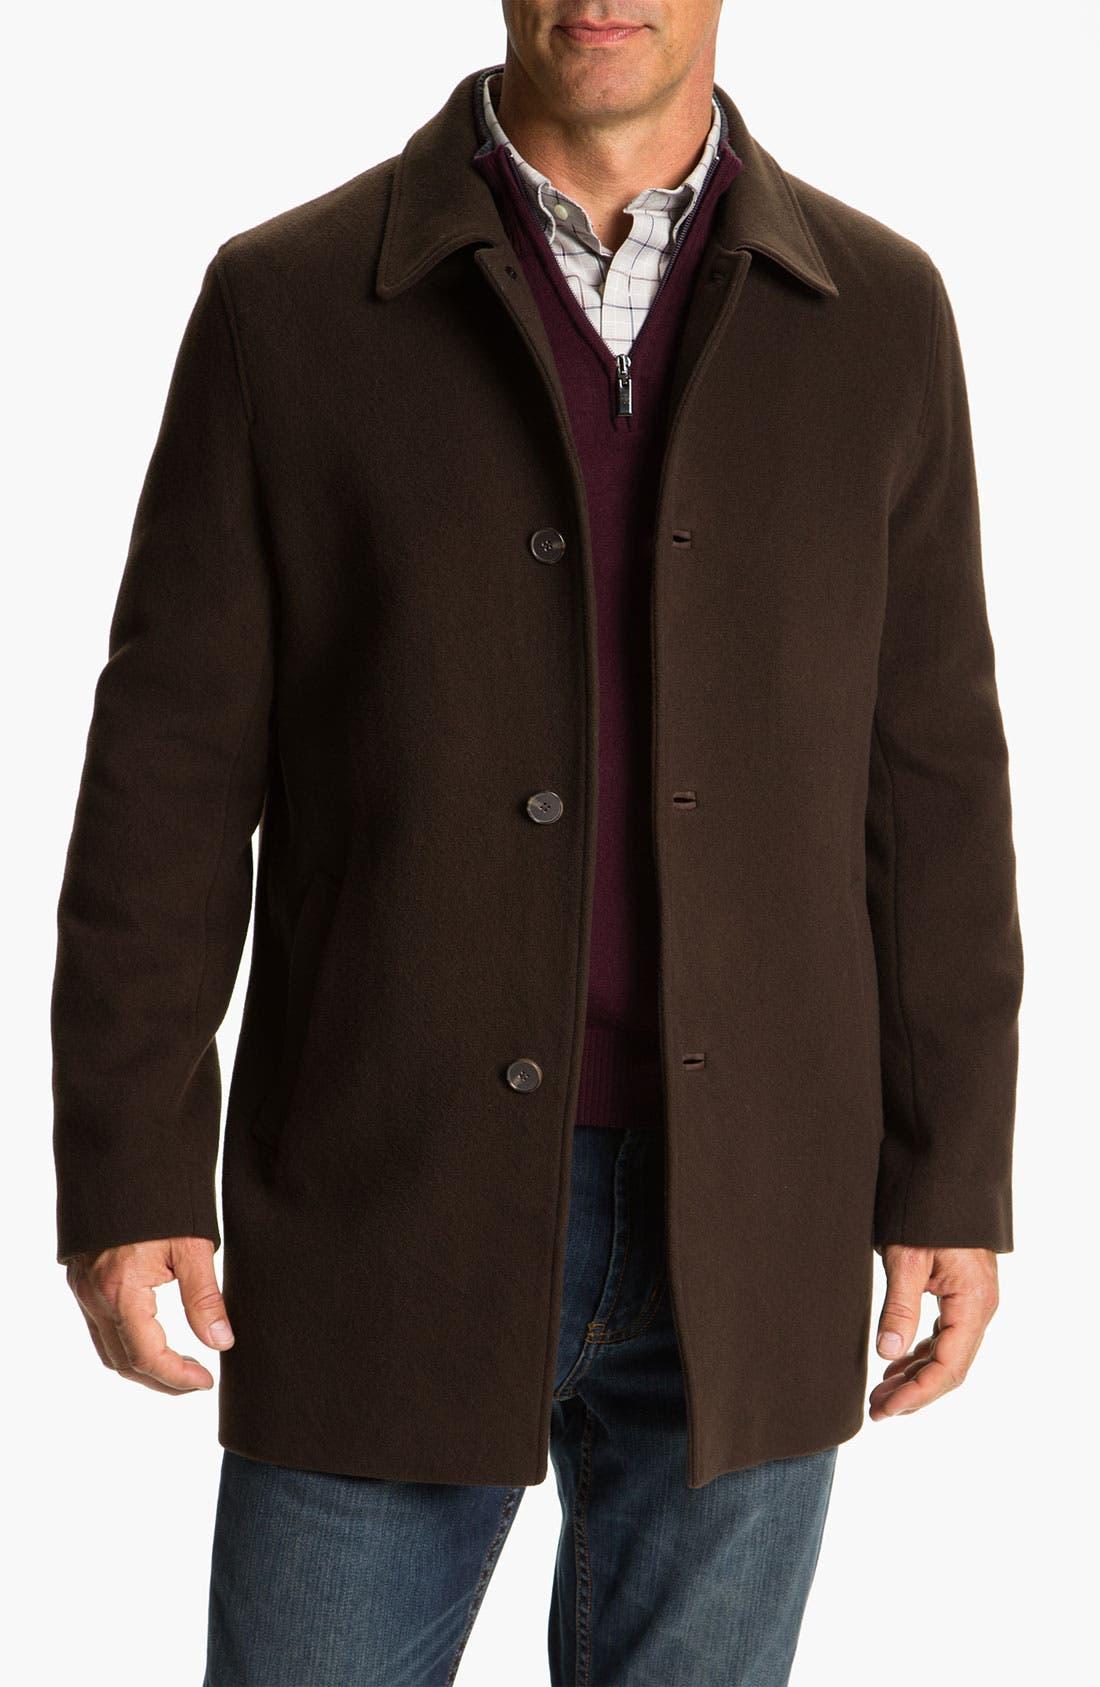 Main Image - Cole Haan Wool & Cashmere Blend Coat (Online Exclusive)